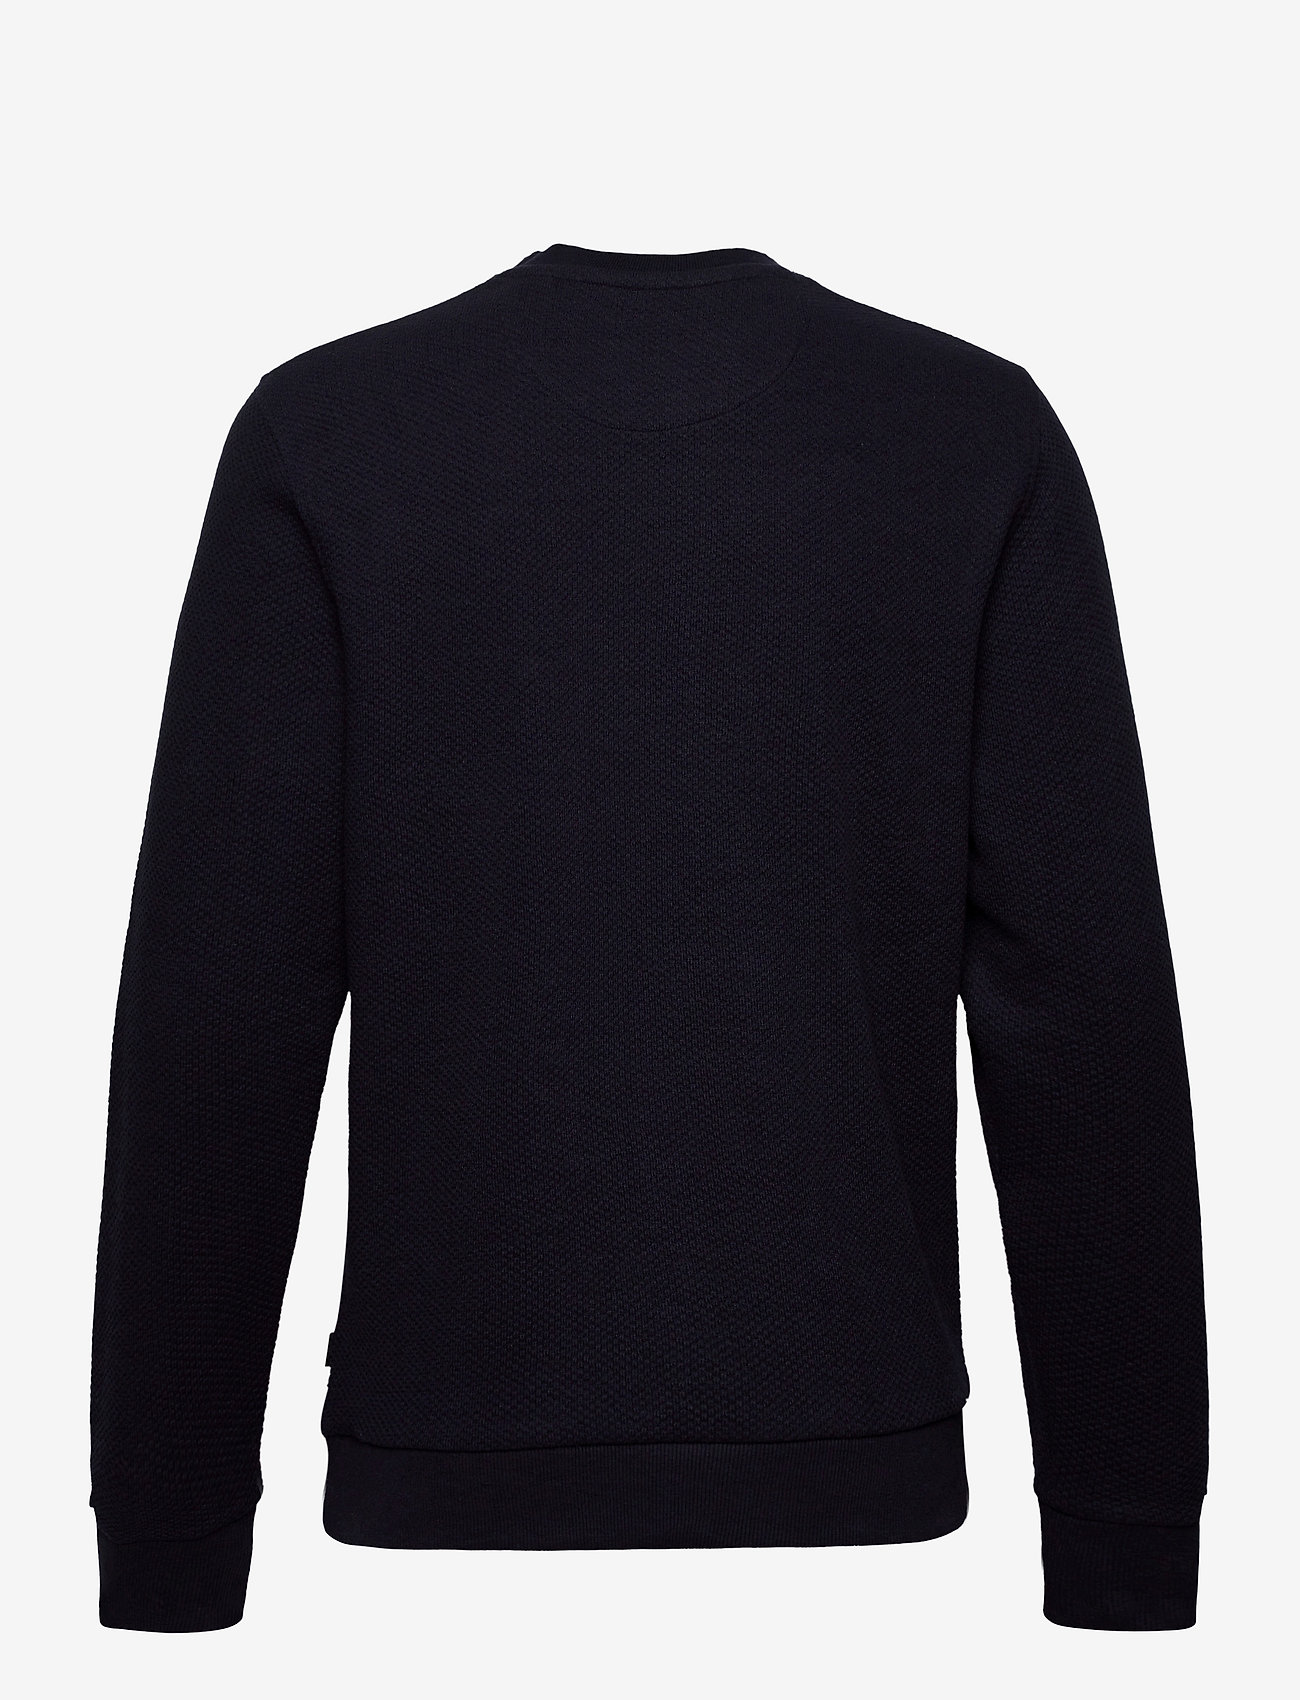 Esprit Casual - Sweatshirts - sweats basiques - navy - 1